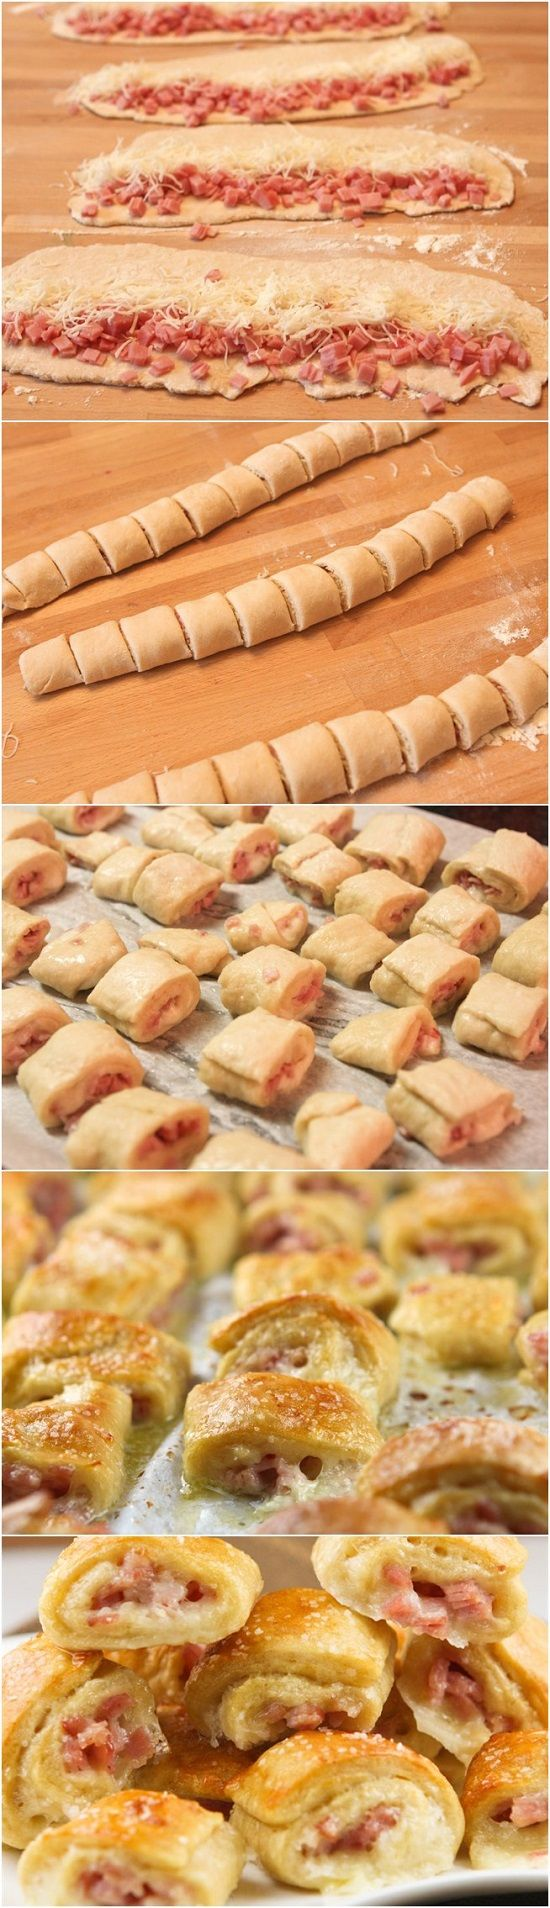 Ham and Cheese Pretzel Bites <<Modify to low carb with cheese/almond flour/coconut flour dough.>>